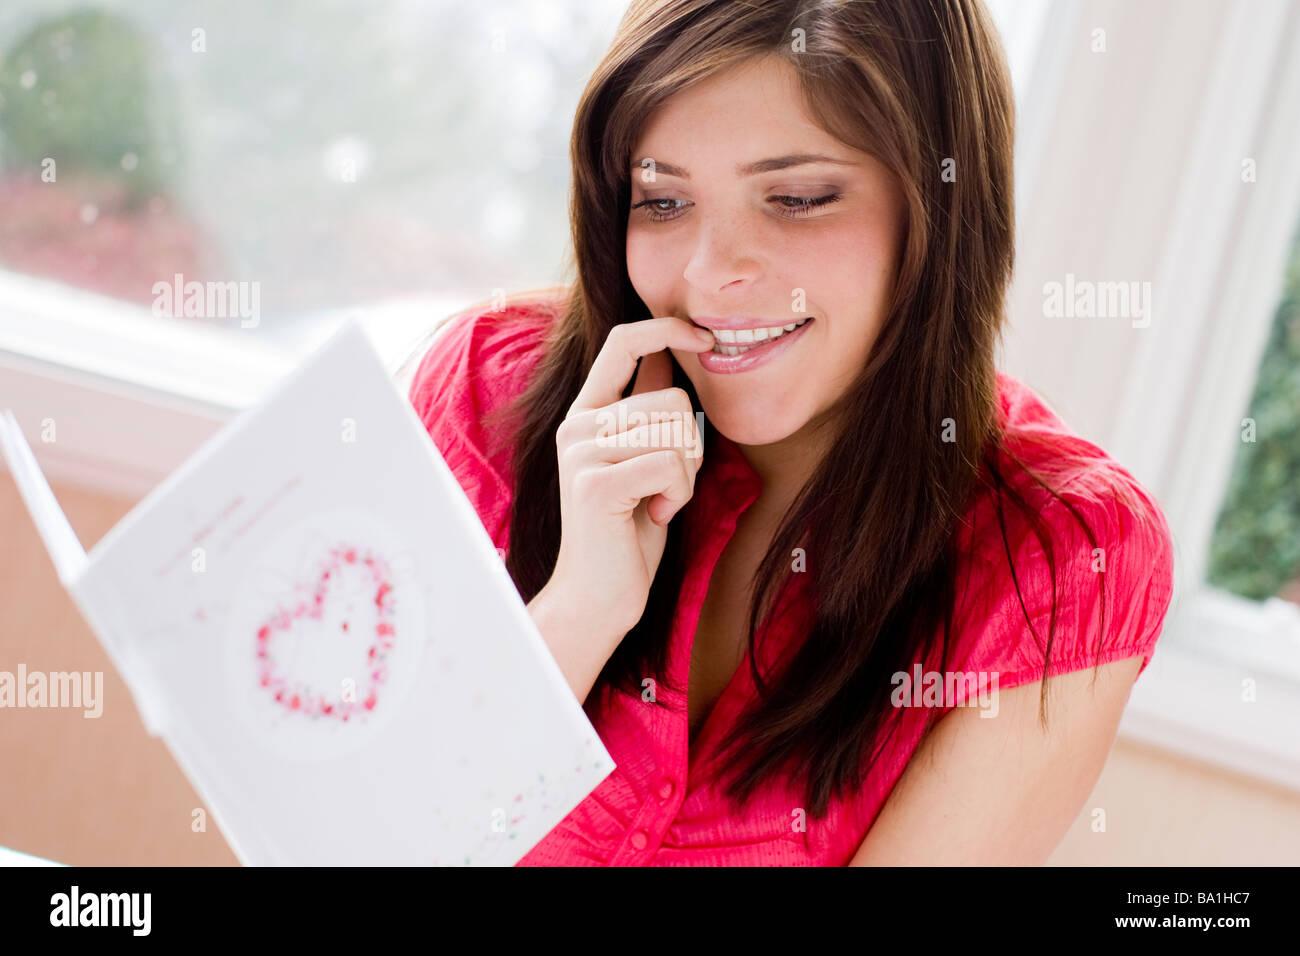 Femme regardant une carte de Saint-Valentin Photo Stock